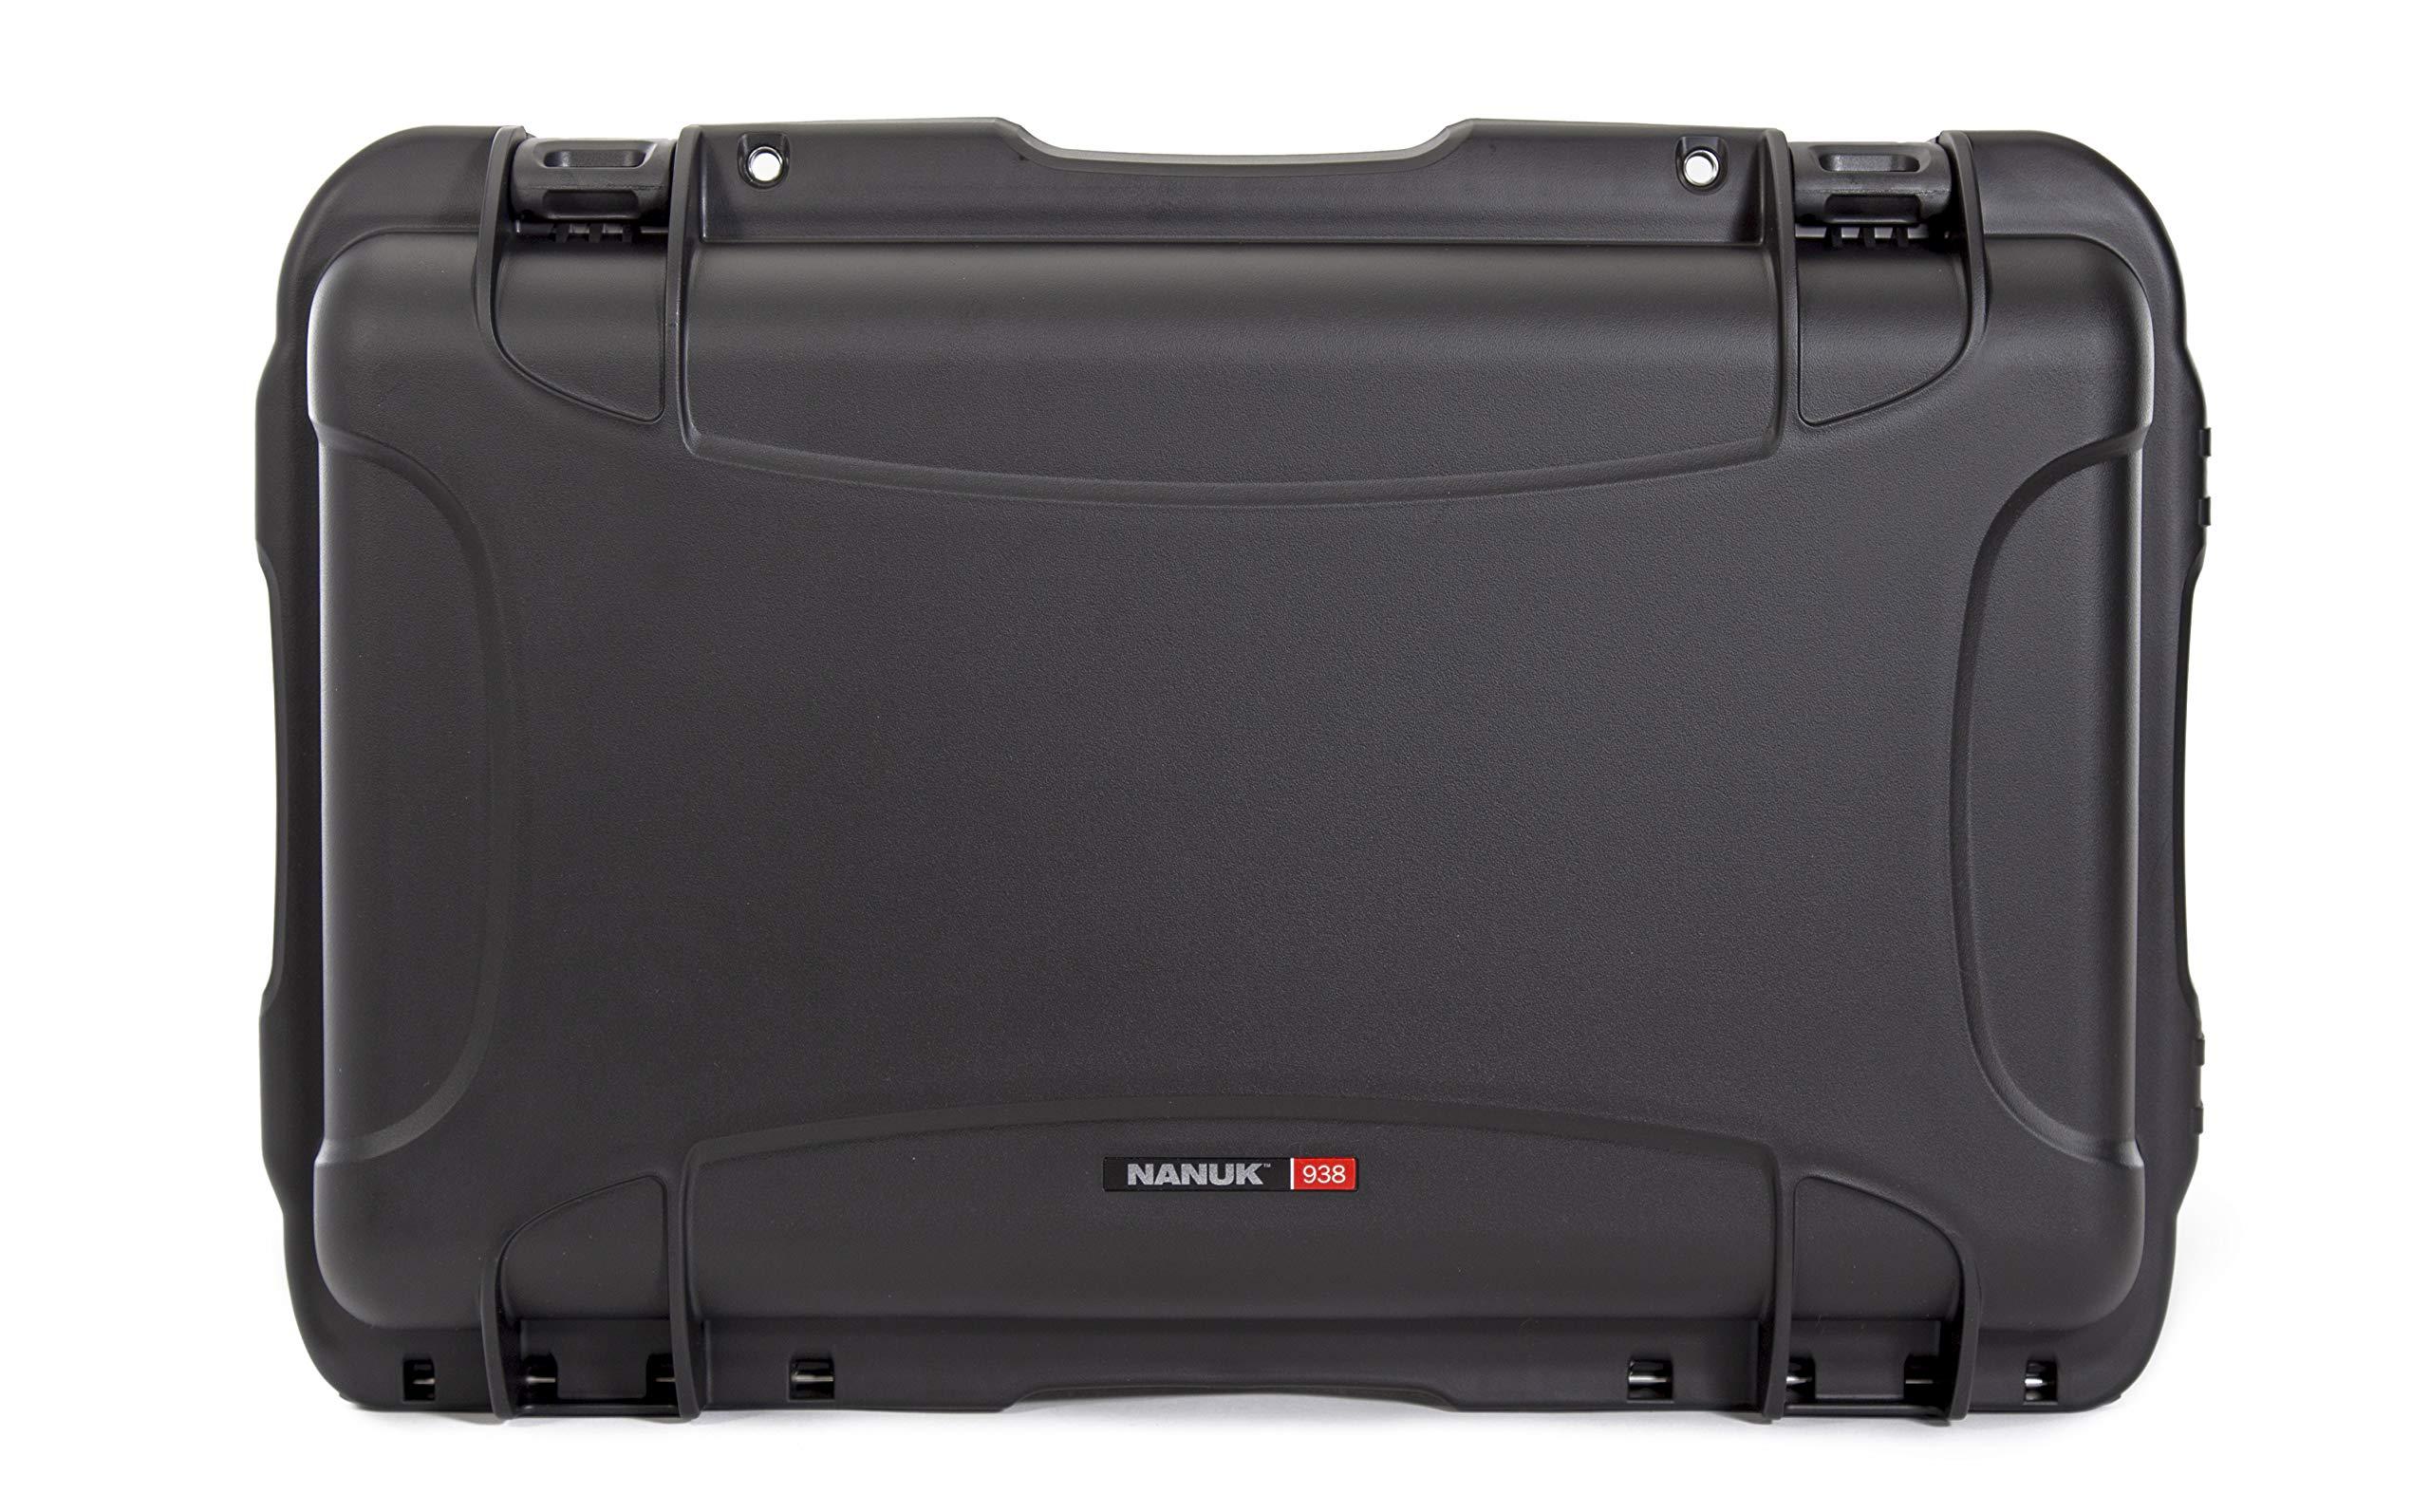 Nanuk 938 Waterproof Hard Case with Wheels and Foam Insert - Black by Nanuk